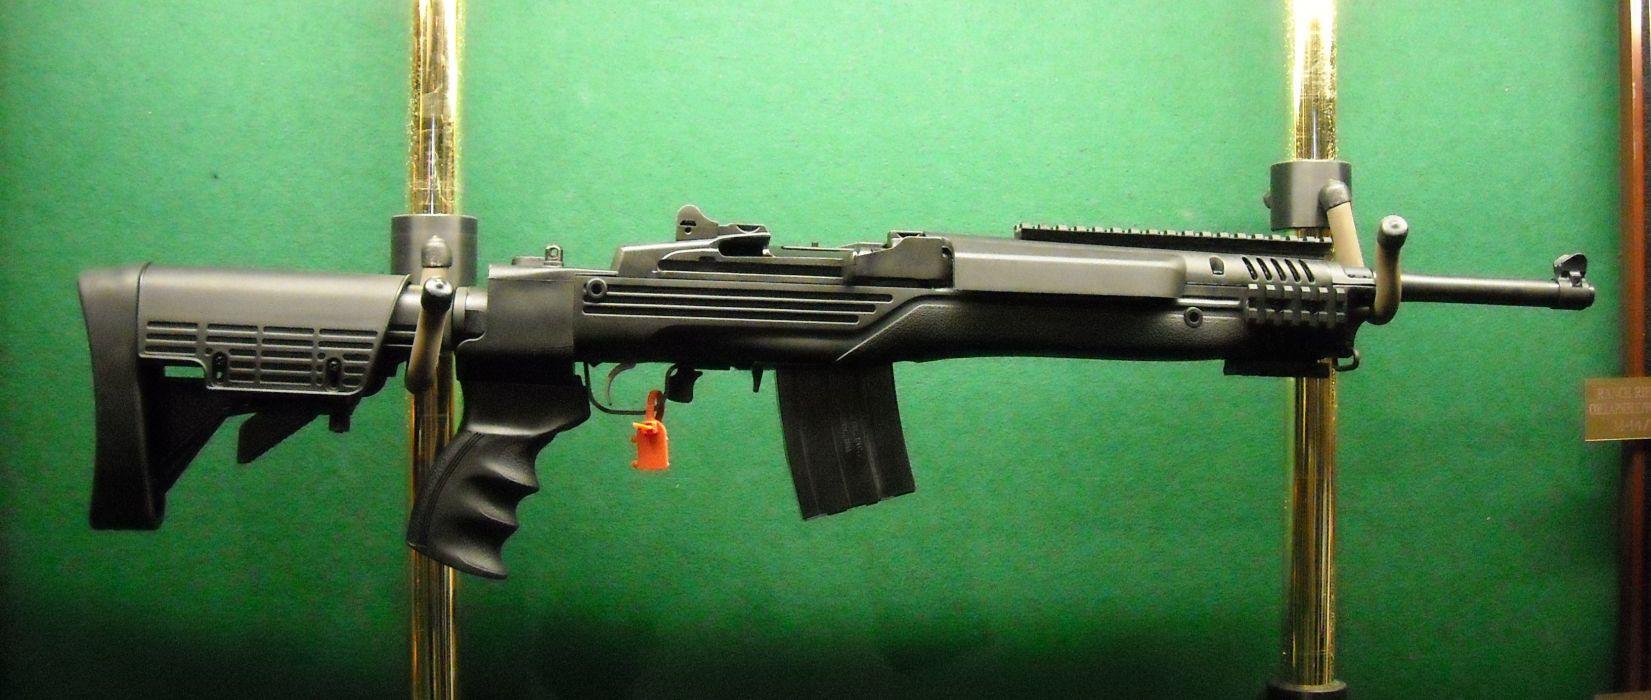 MINI-14 assault rifle weapon gun military mini (23) wallpaper